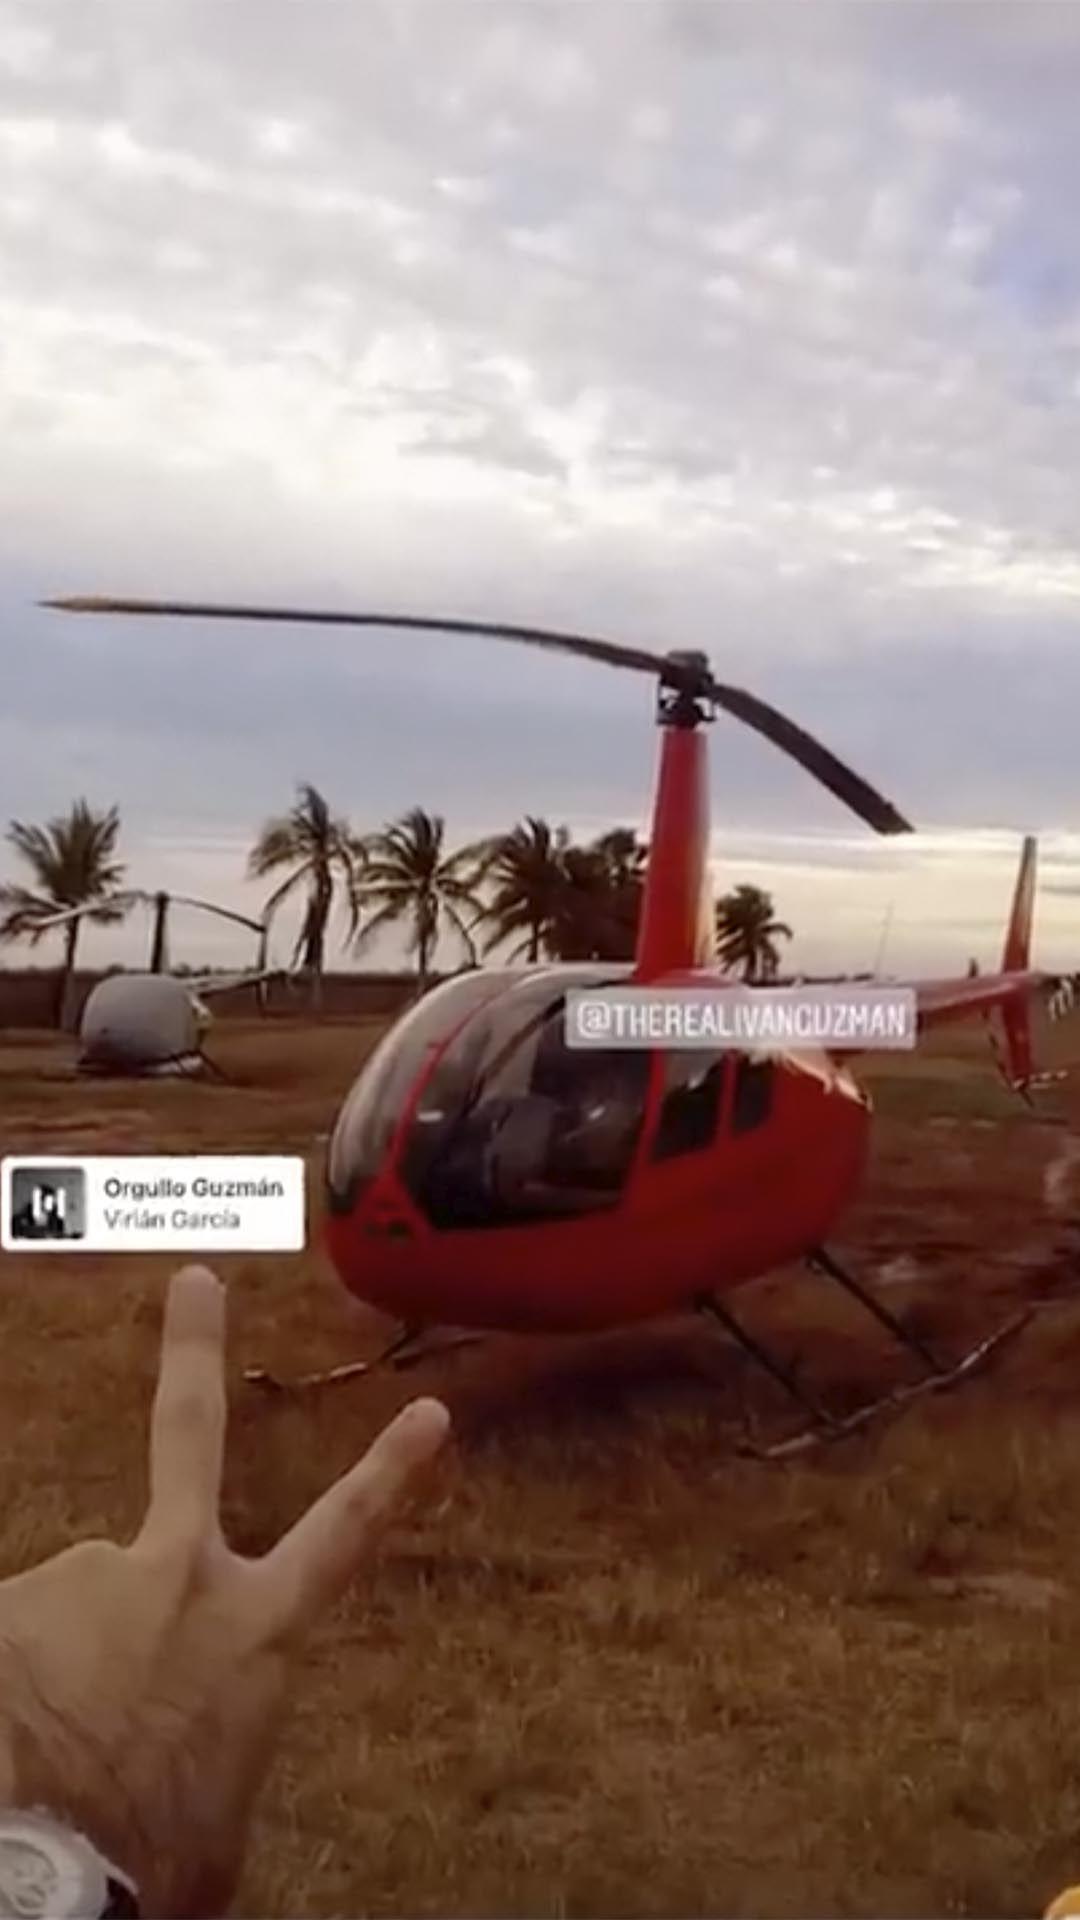 Helicóptero Archivaldo Guzmán (Foto: Captura de pantalla)